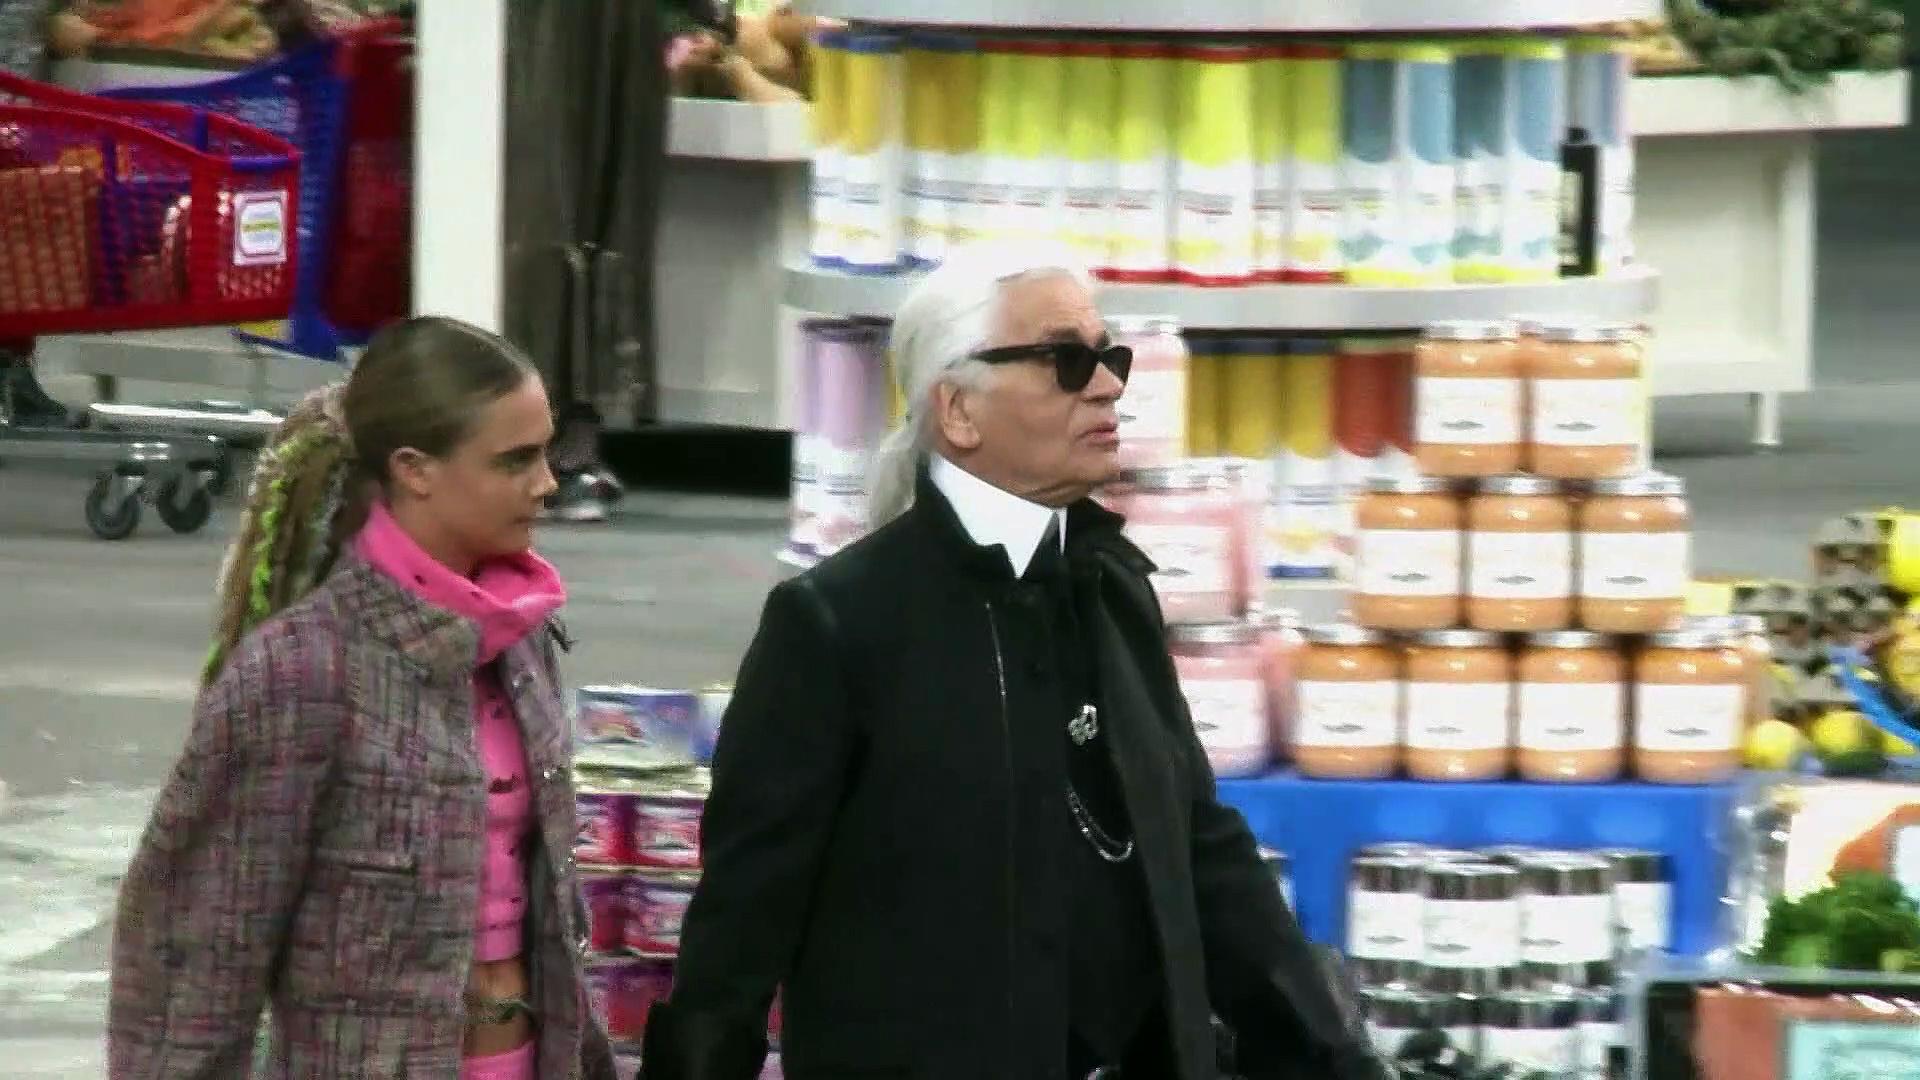 CELEBRITY OF THE WEEK - Karl Lagerfeld